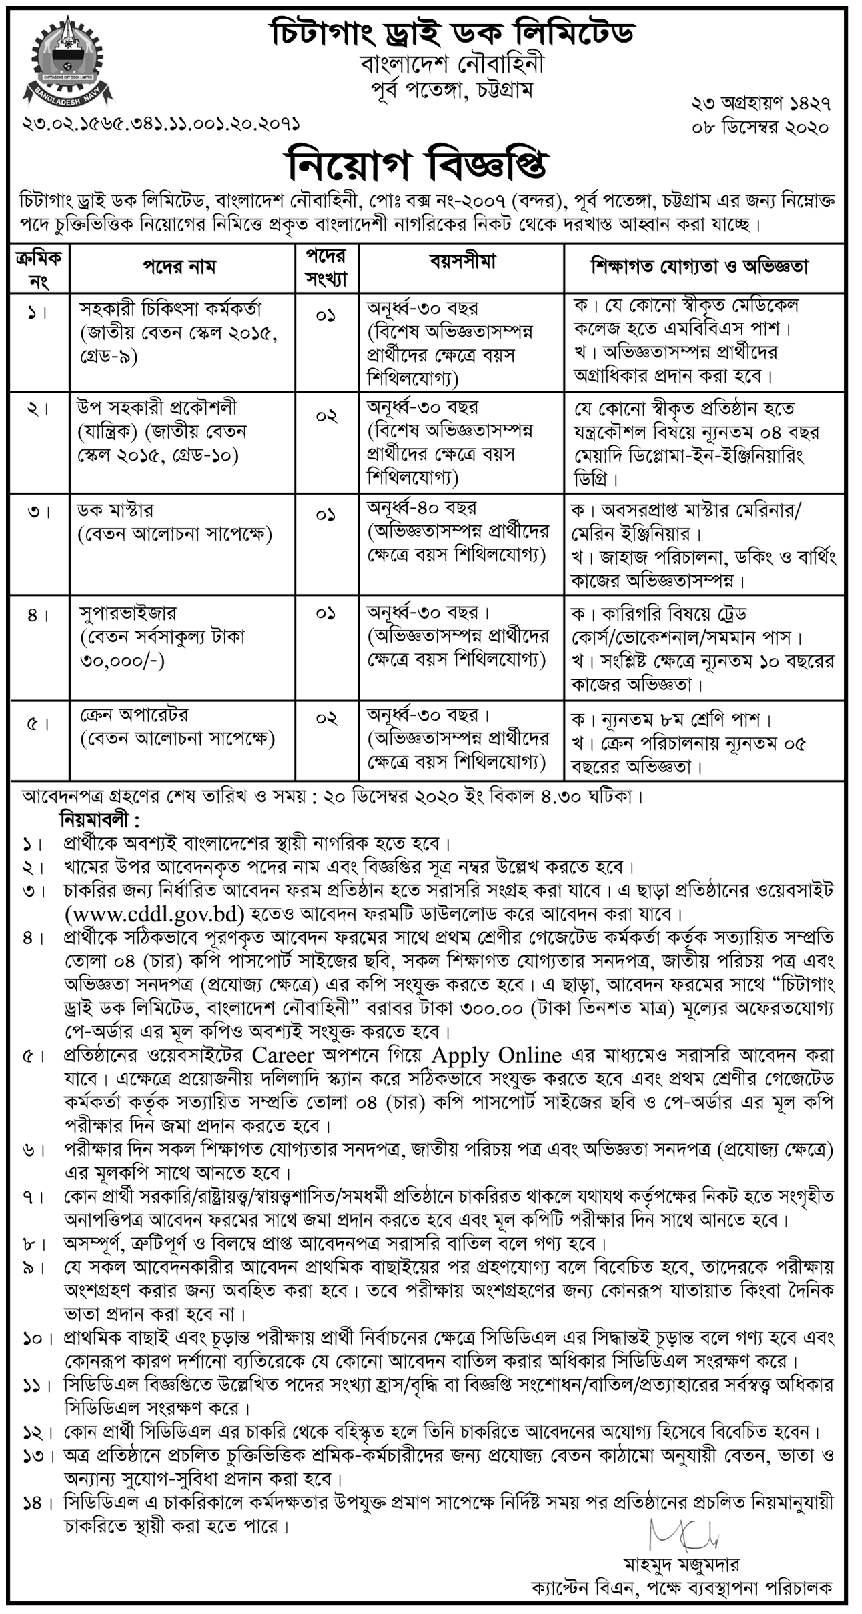 Chittagong Dry Dock Limited CDDL Job Circular 2020